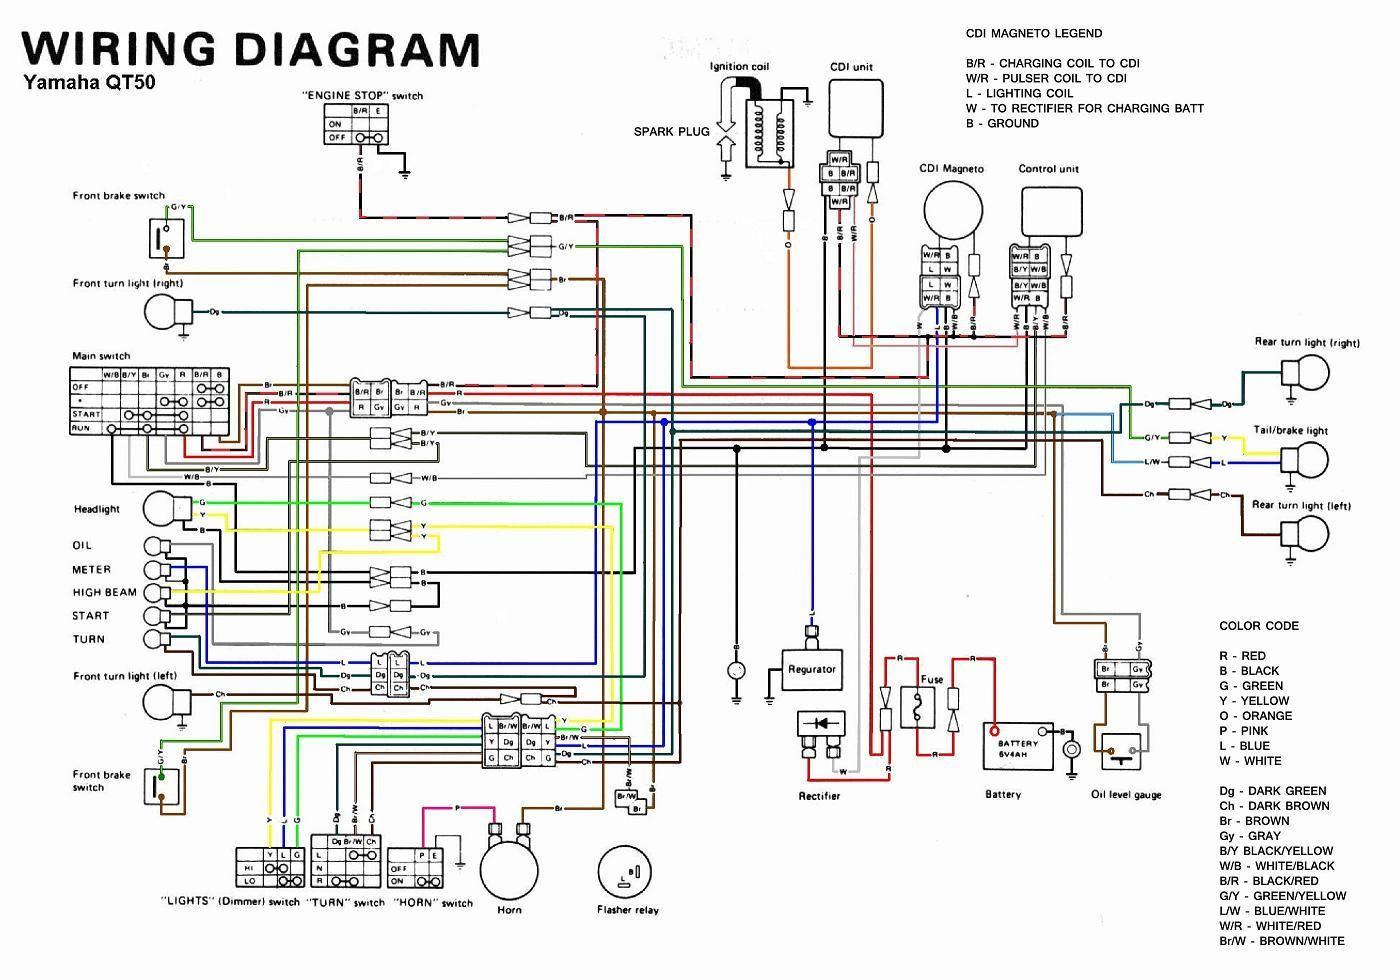 2004 Subaru Outback Wiring Diagram in 2021 | Motorcycle wiring, Yamaha  engines, Yamaha | 2004 50cc Scooter Wiring Diagram |  | Pinterest